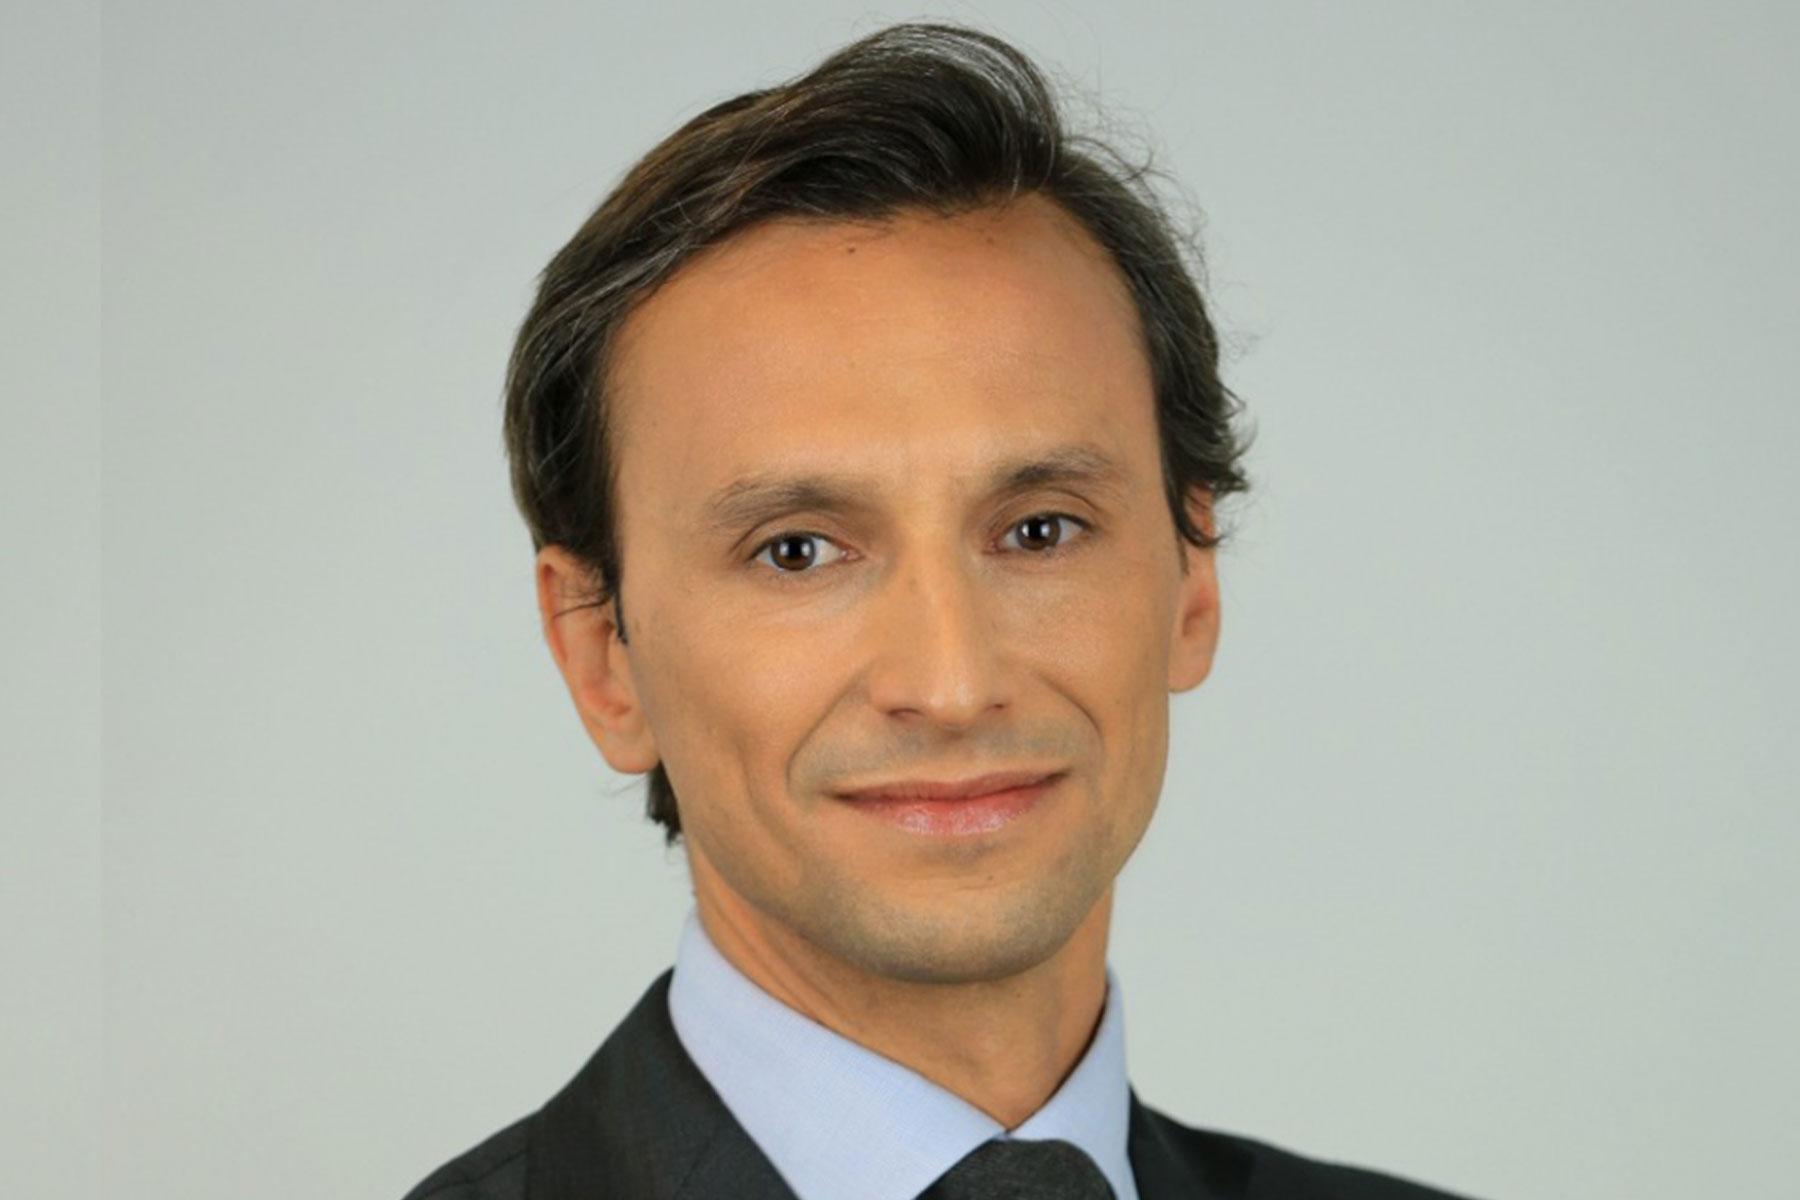 Photographic portrait of Etienne Costes